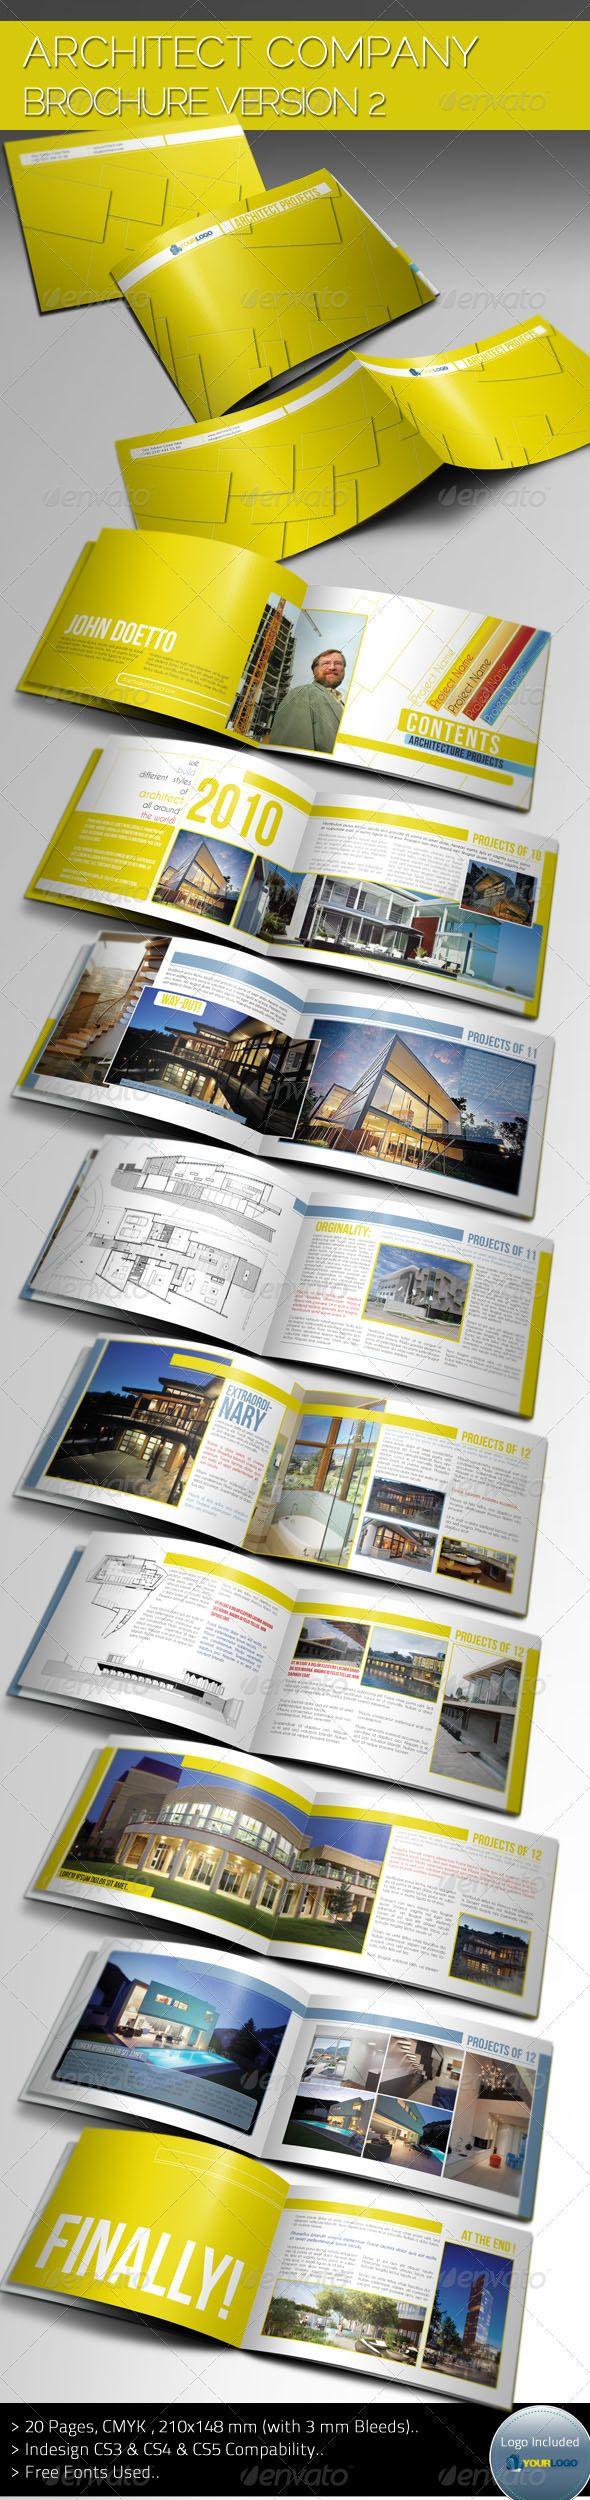 Best 25+ Architecture portfolio pdf ideas on Pinterest